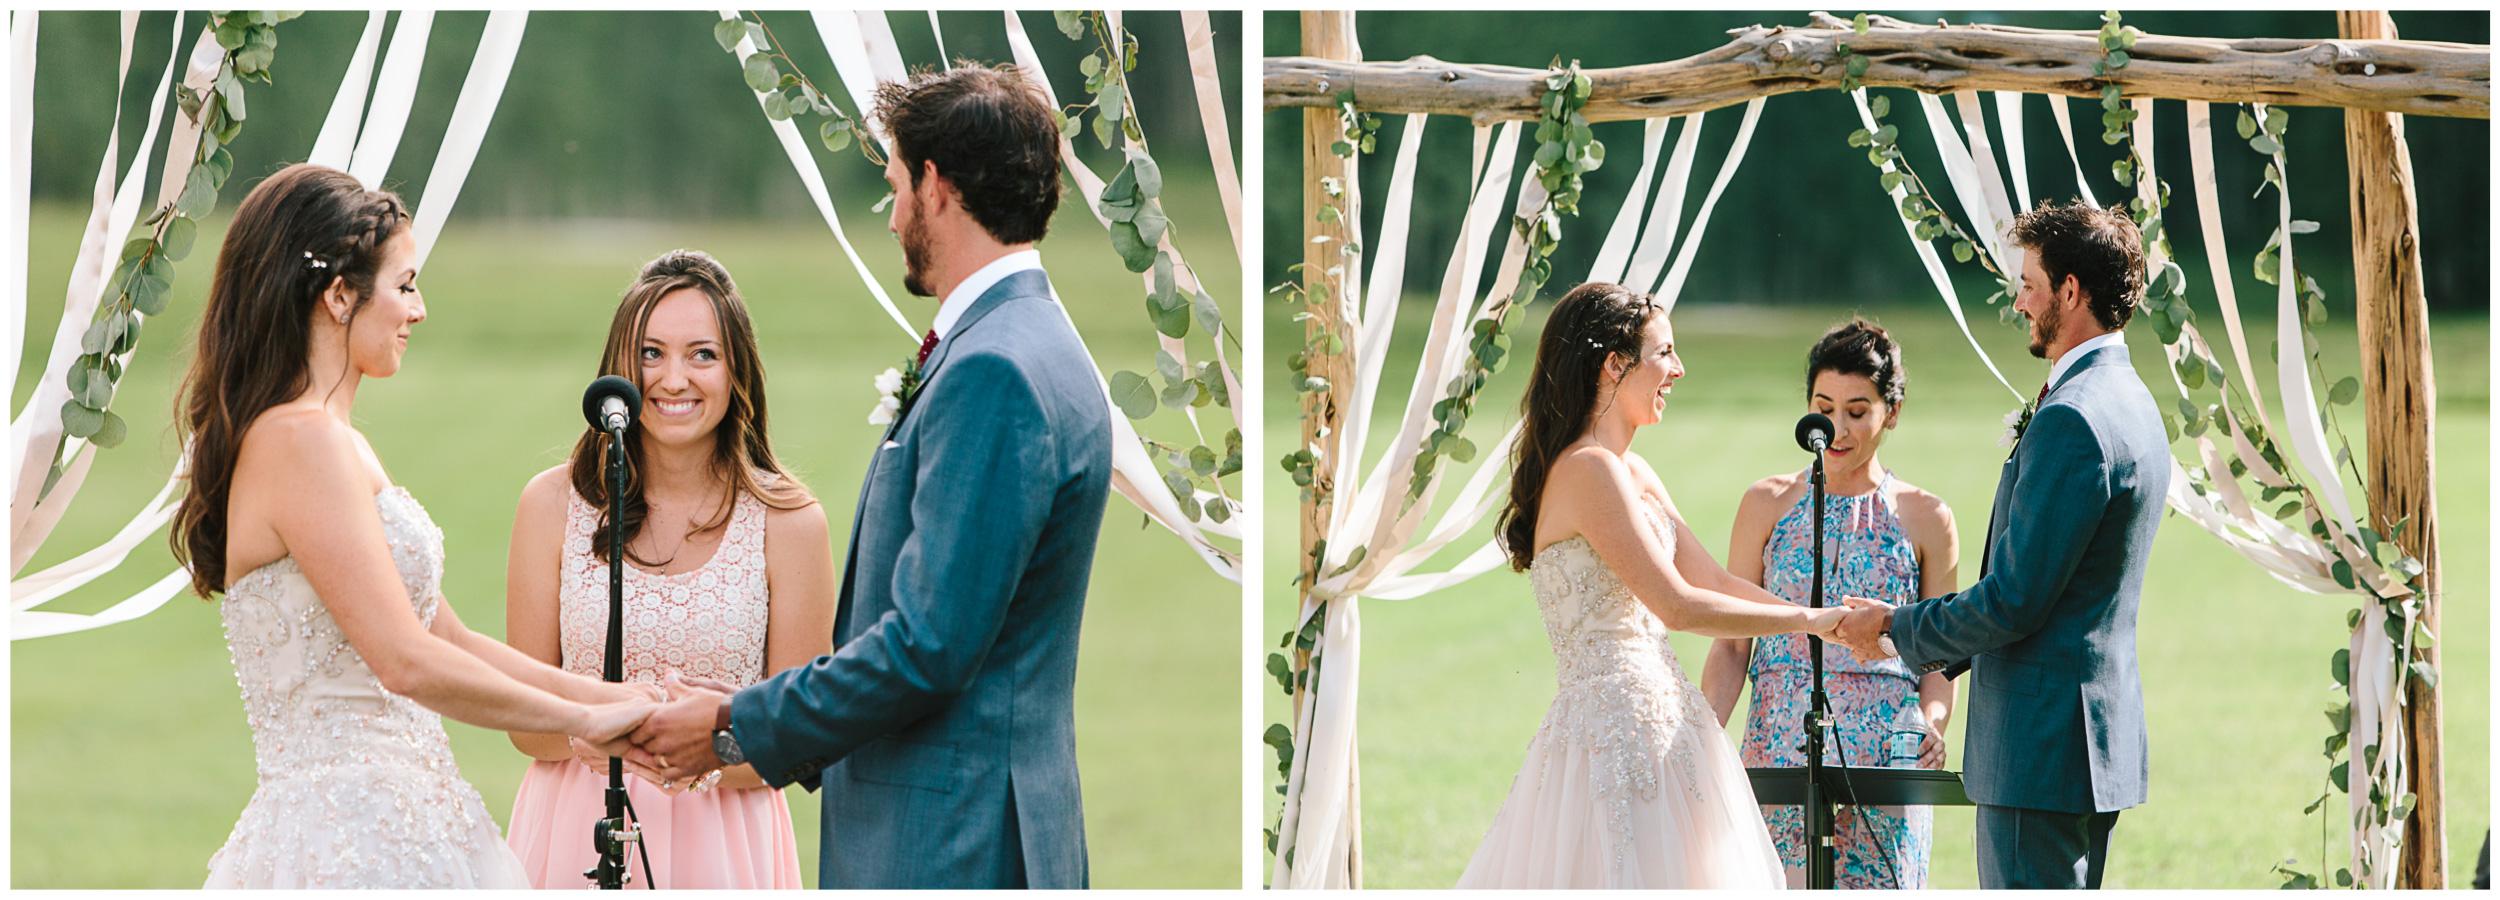 aspen_wedding_40.jpg